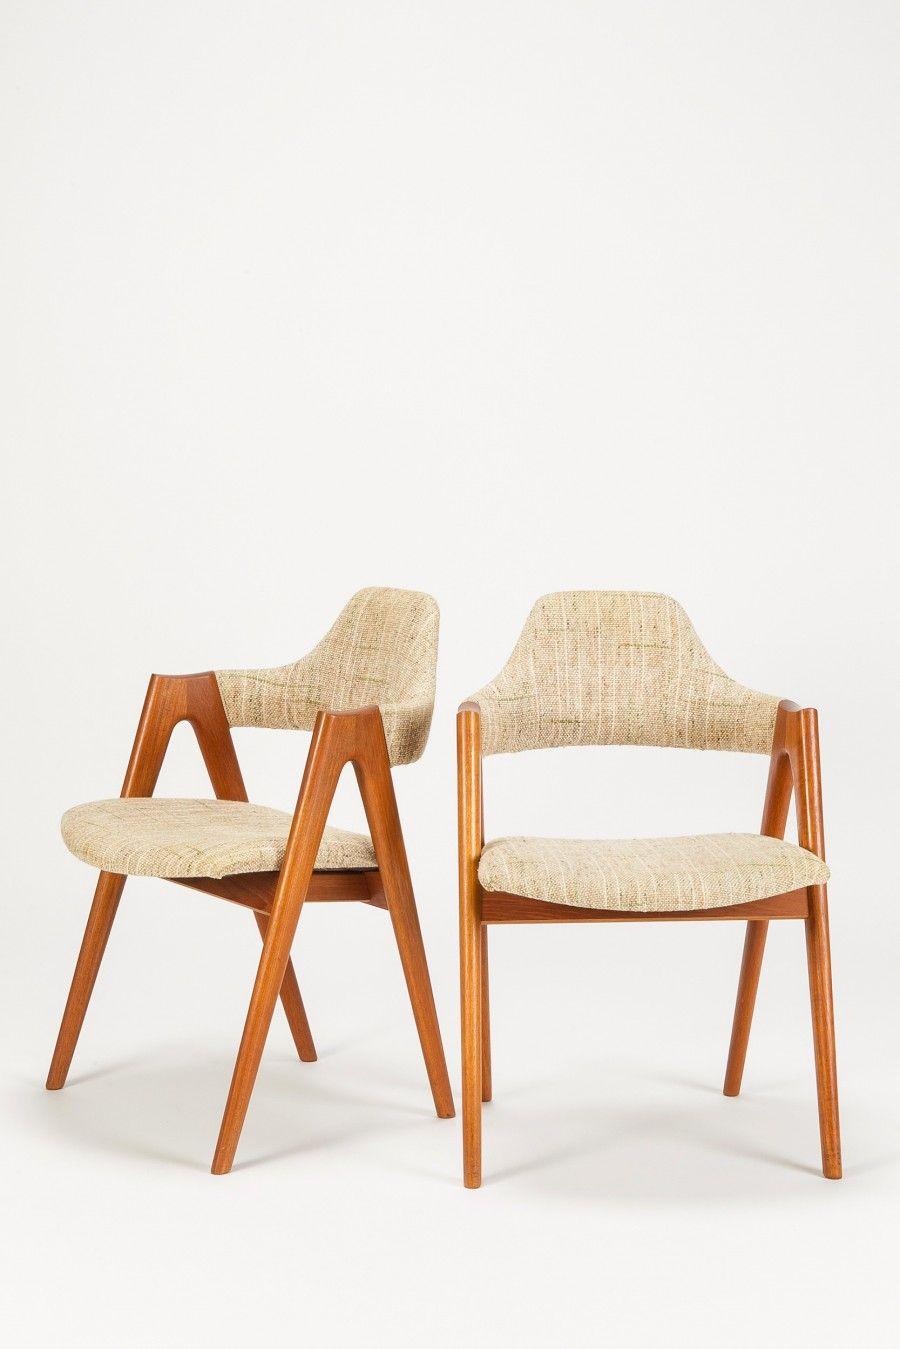 Kai Kristiansen Teak Compass Chairs For Sva Mobler 1960s